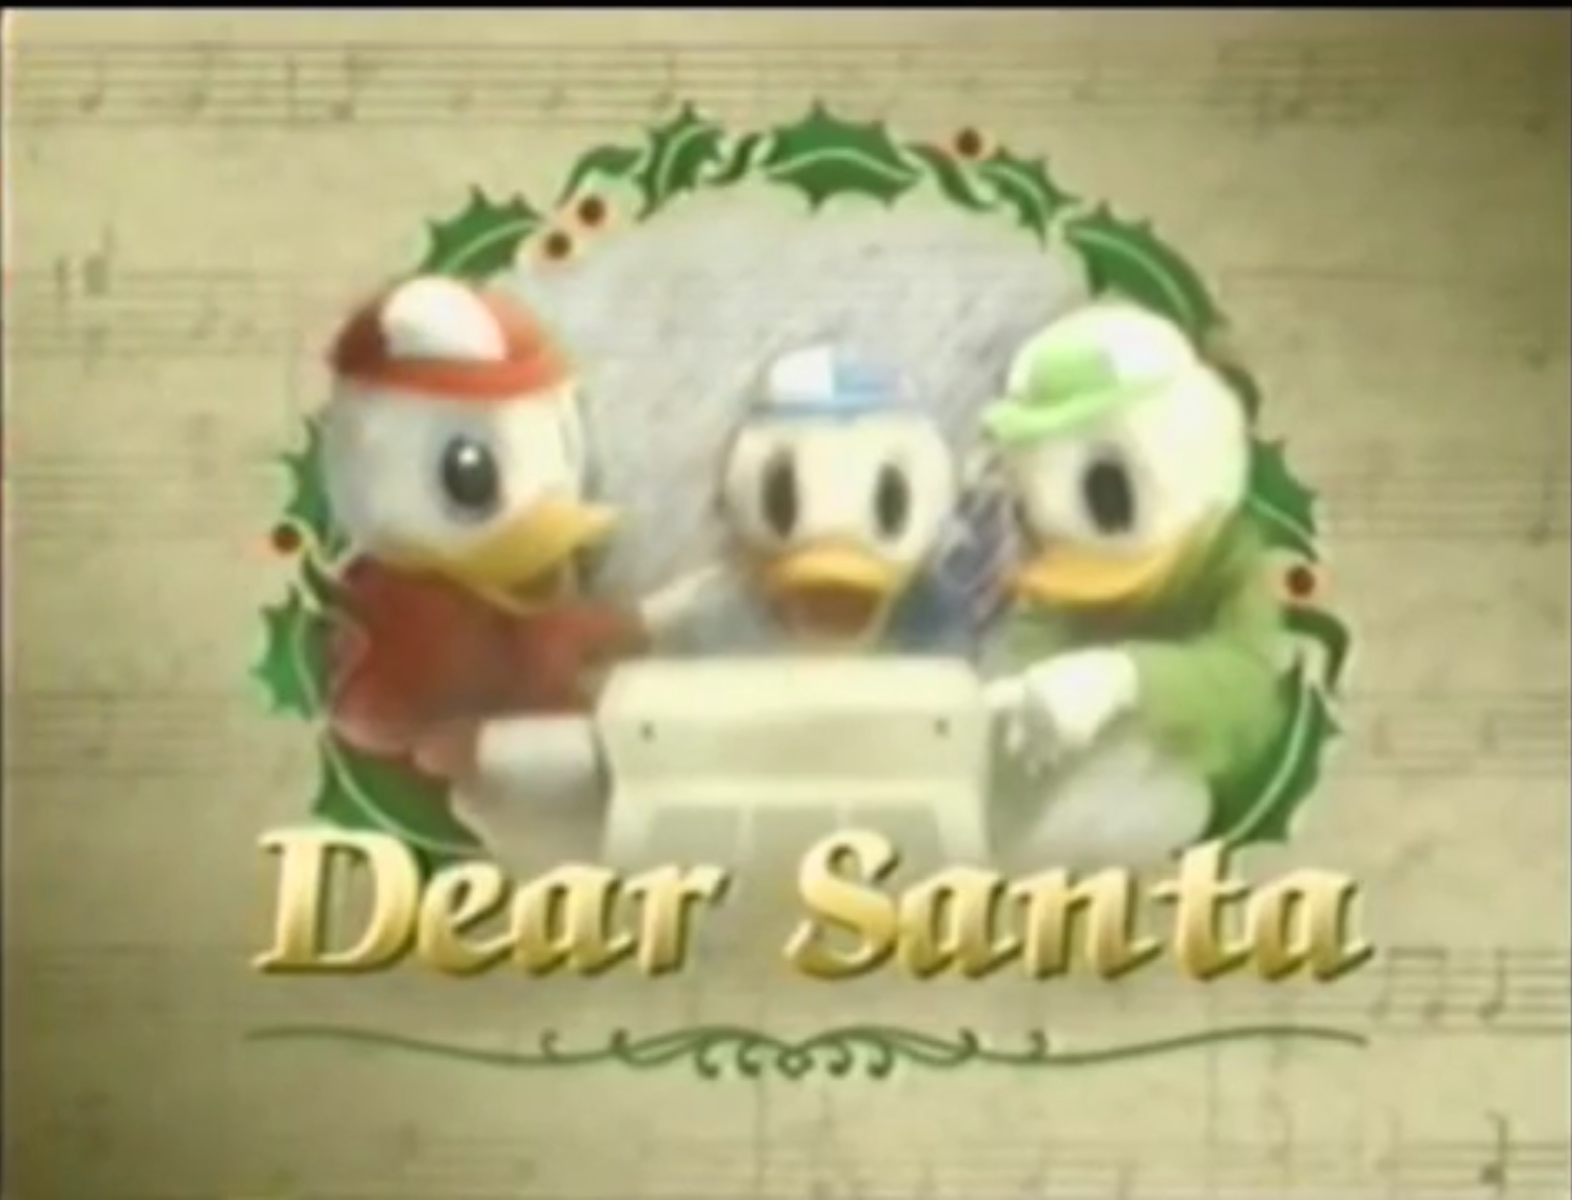 Dear Santa (song) | Christmas Specials Wiki | FANDOM powered by Wikia